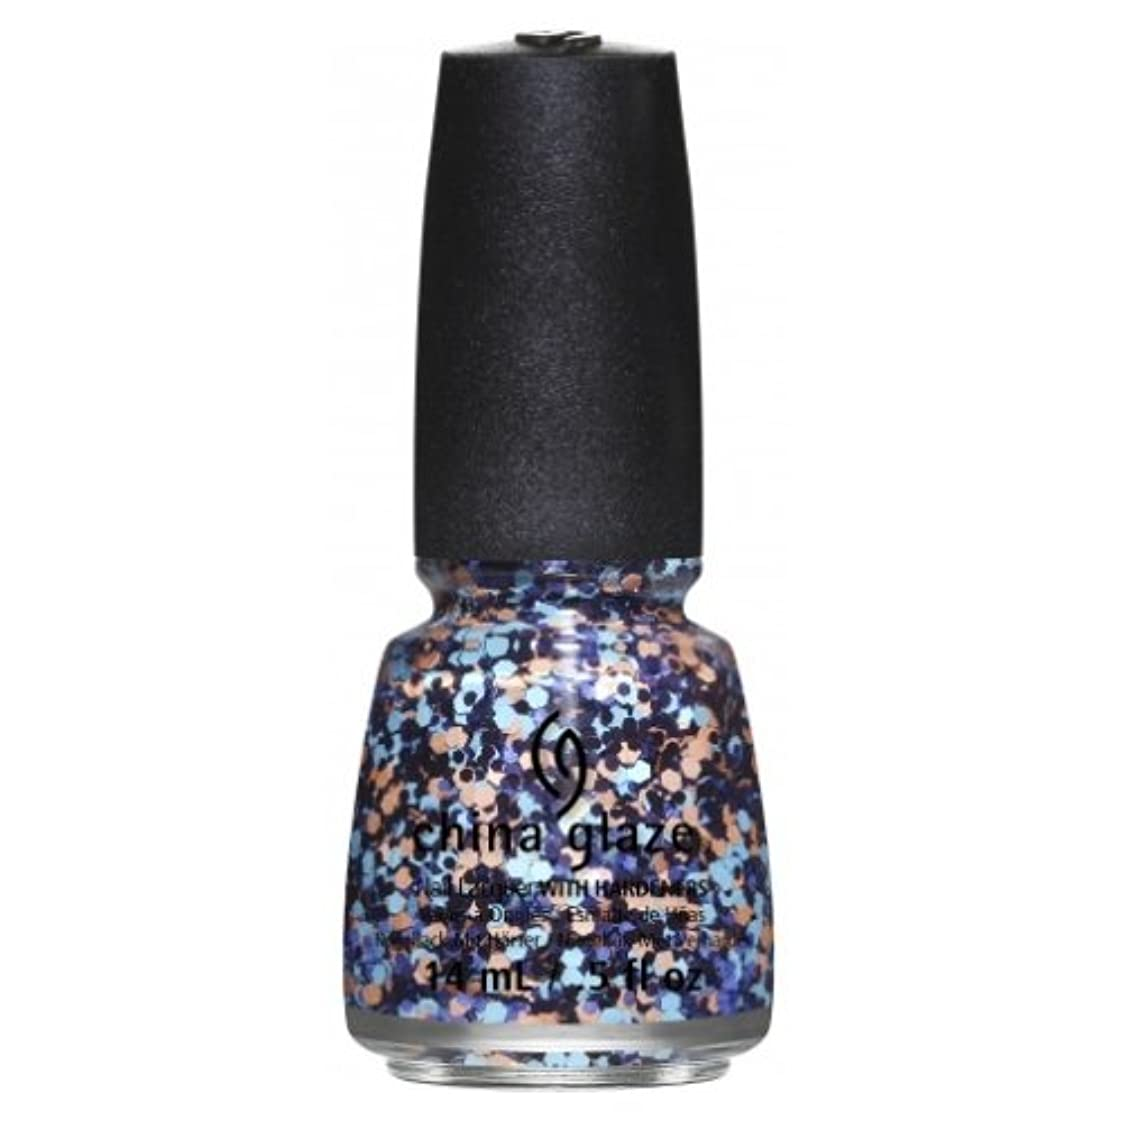 封筒自治的議会CHINA GLAZE Nail Lacquer - Suprise Collection - Glitter Up (並行輸入品)